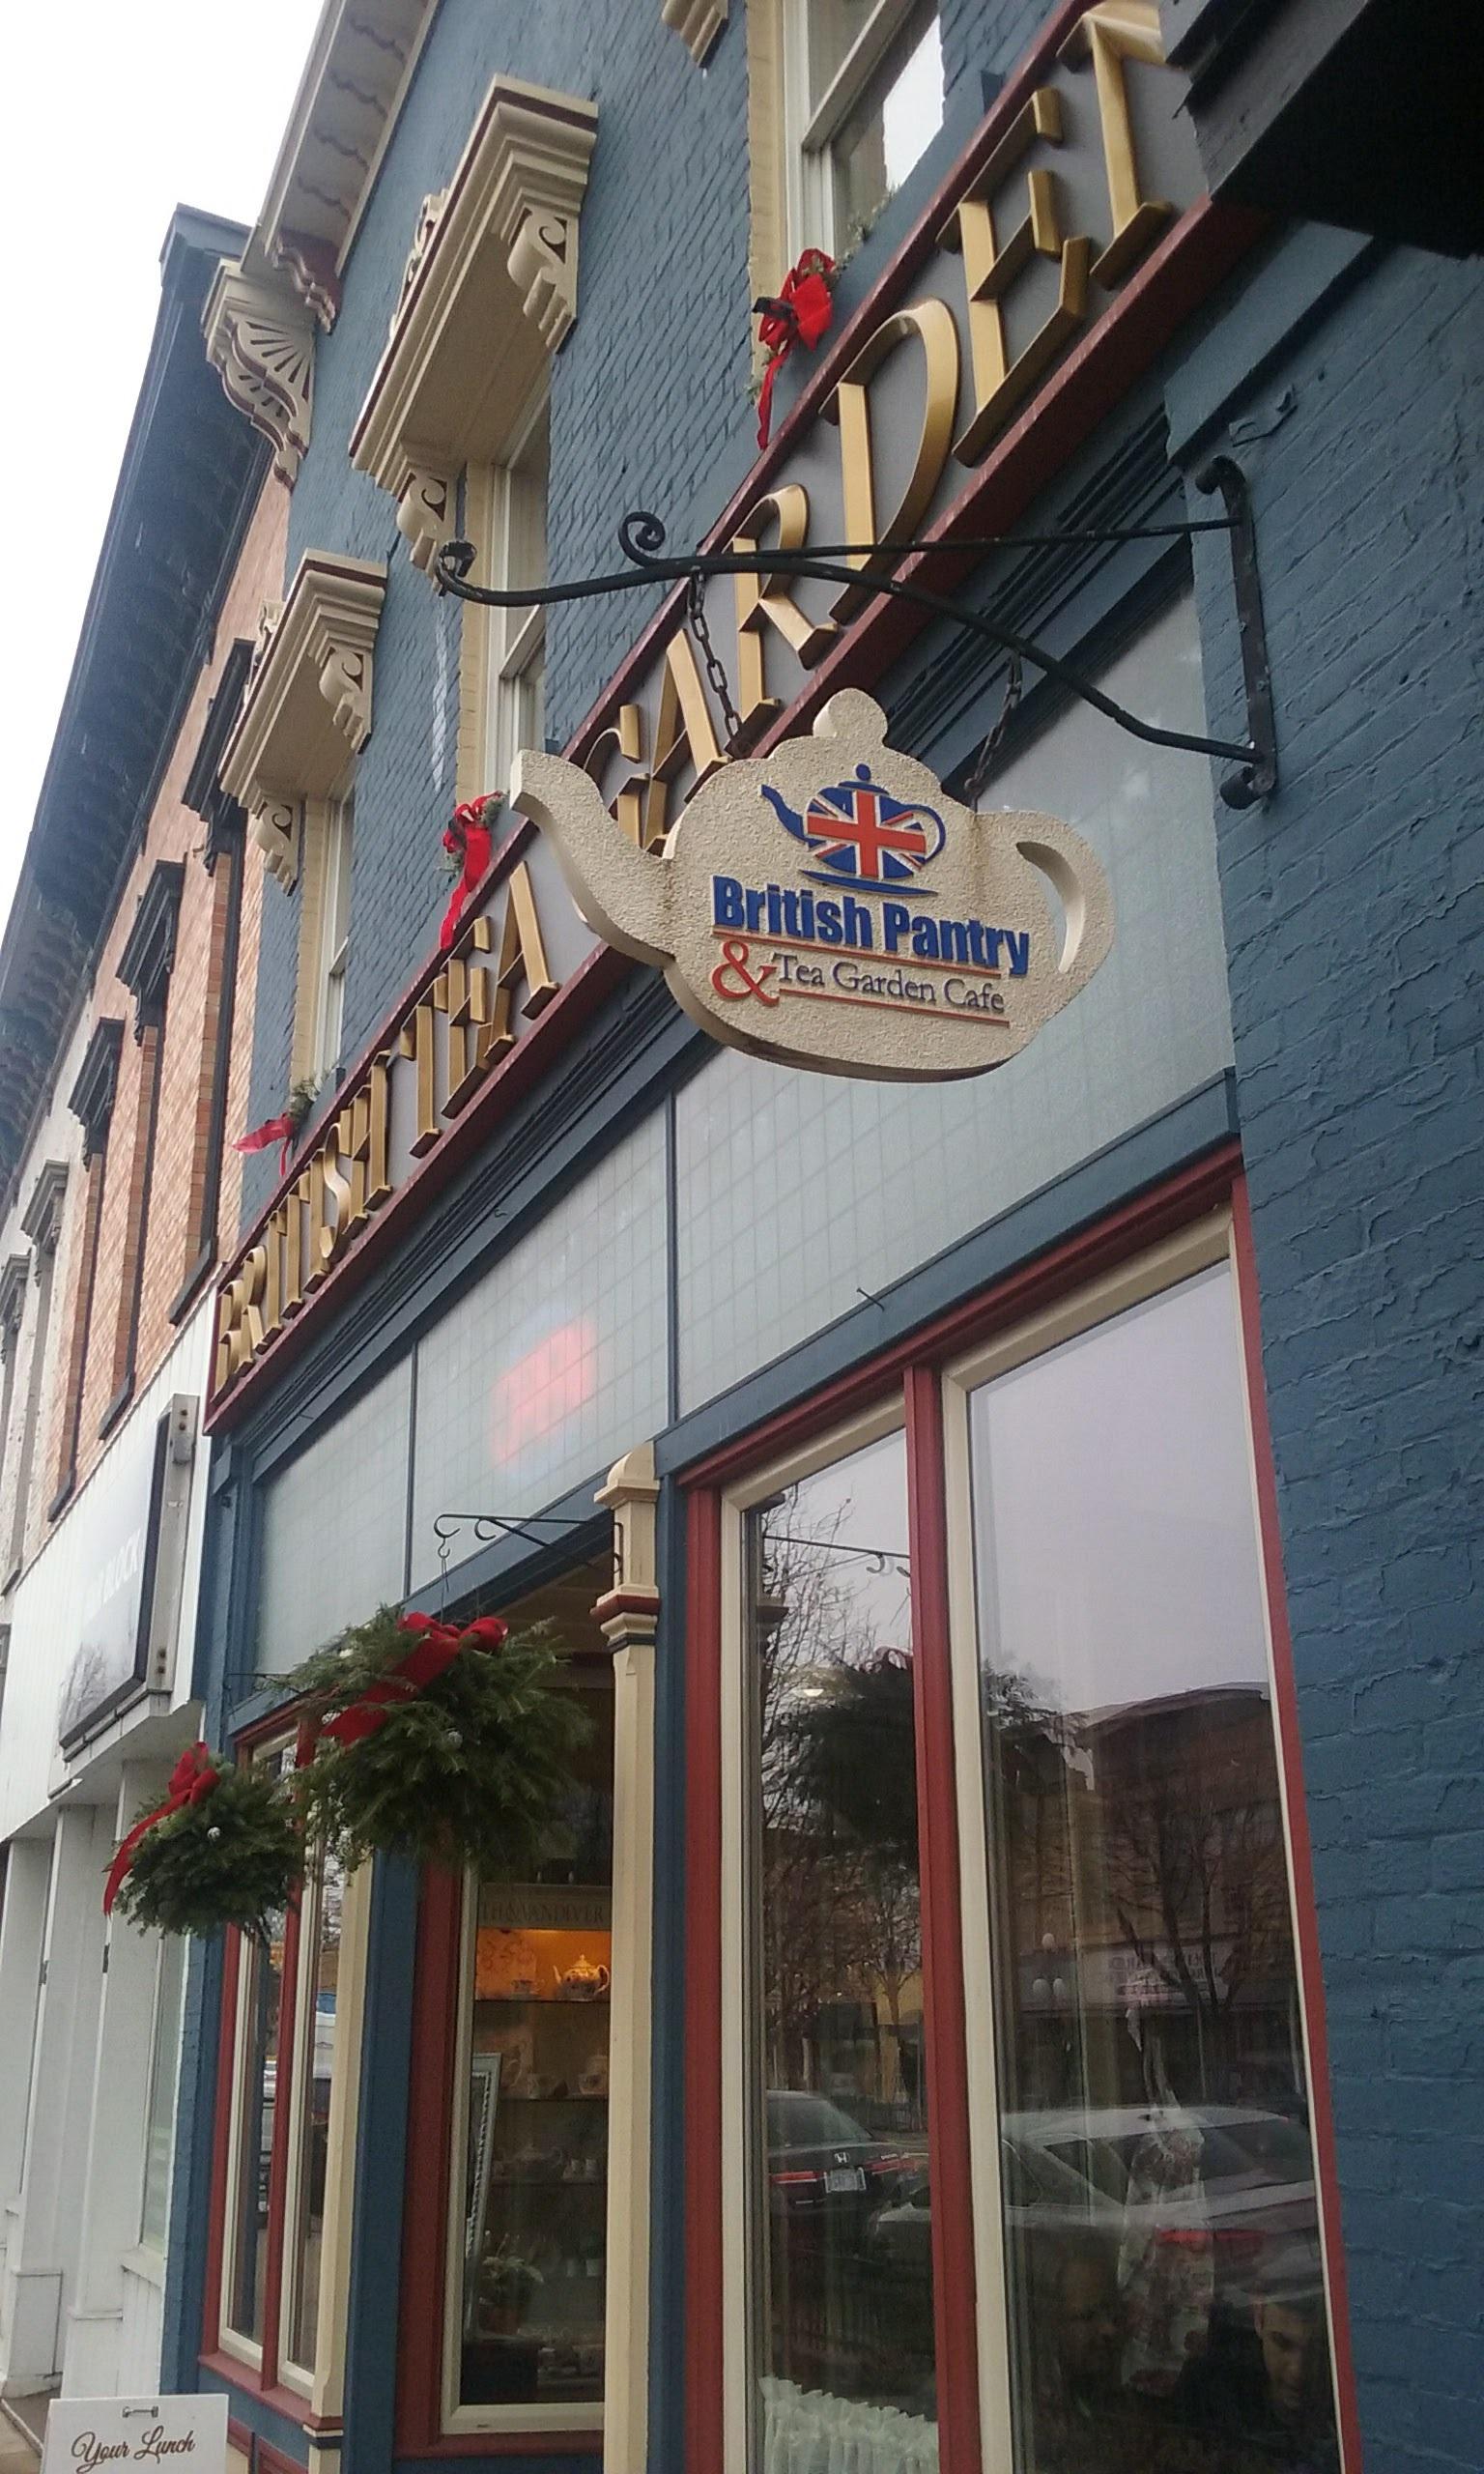 The British Tea Garden and Rooftop Cafe in Tecumseh, Michigan